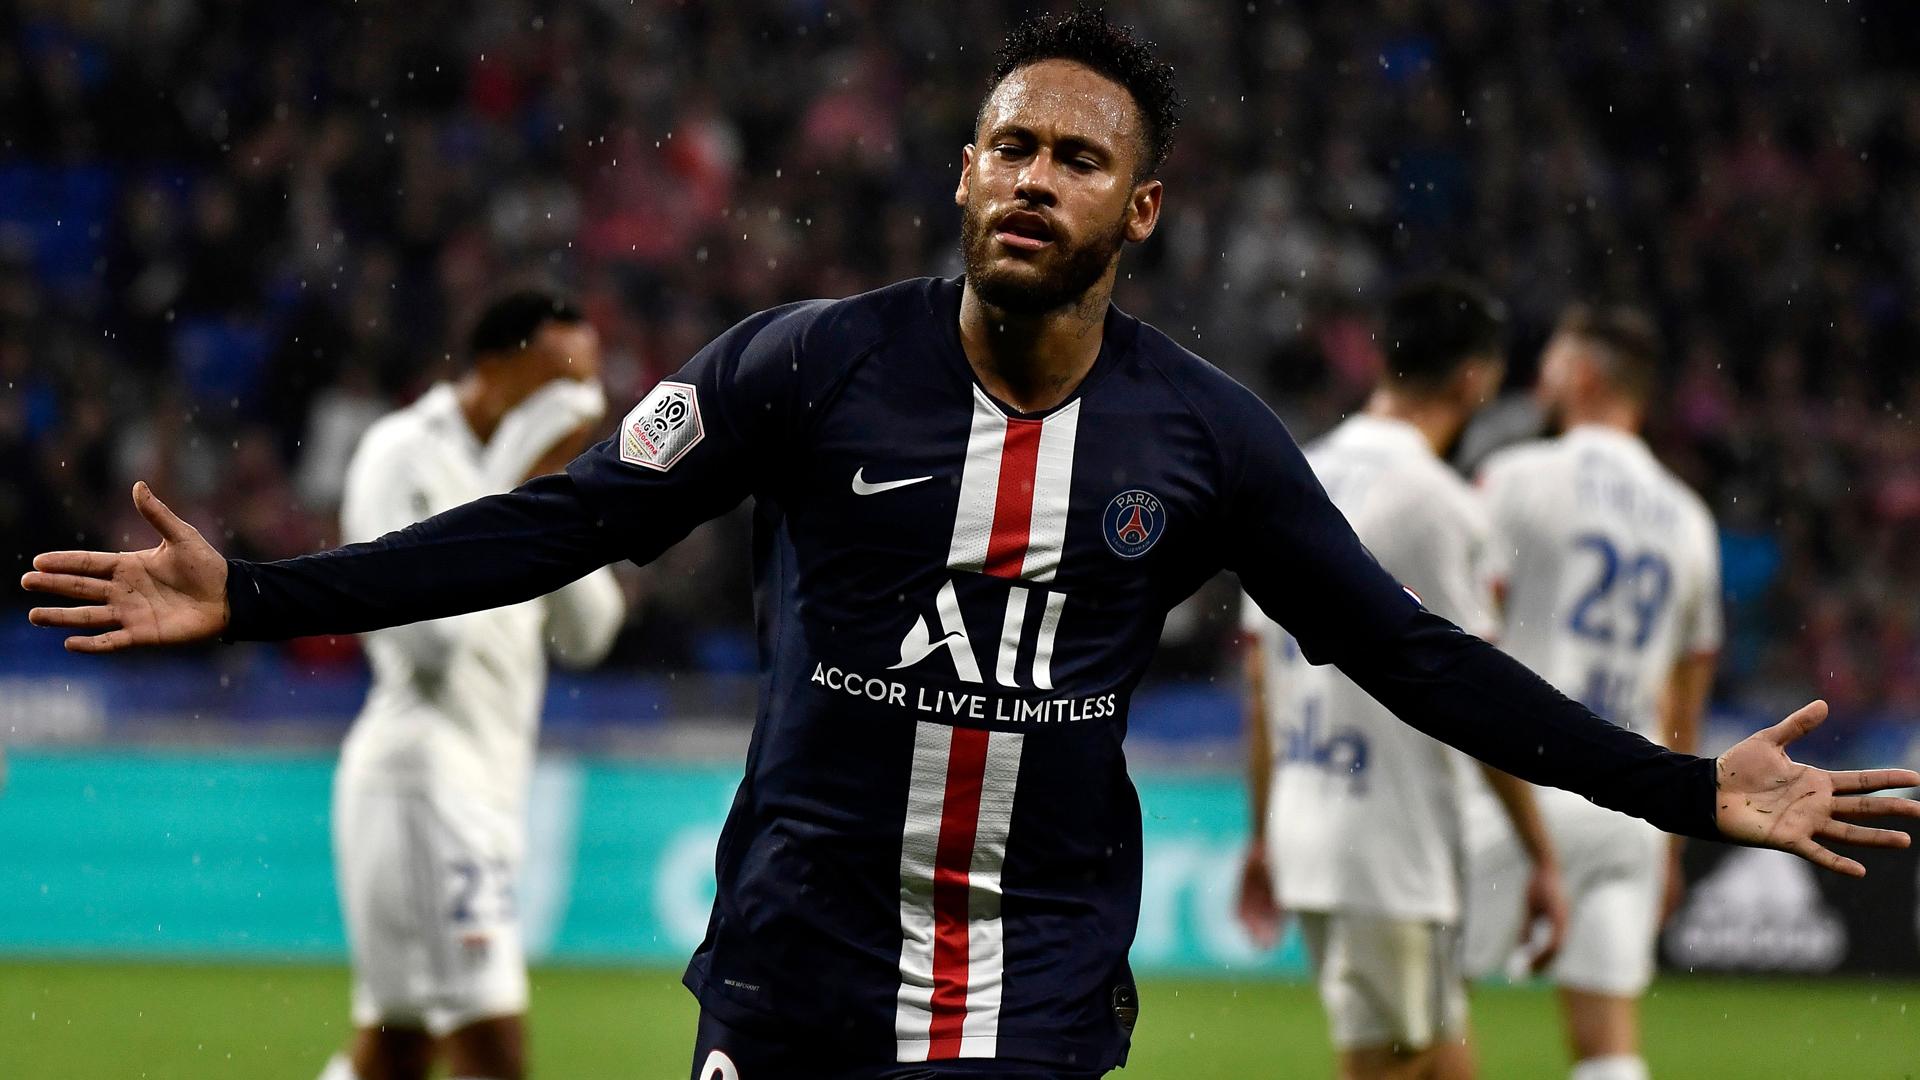 He can still do better – Tuchel wants more from Neymar after PSG winner